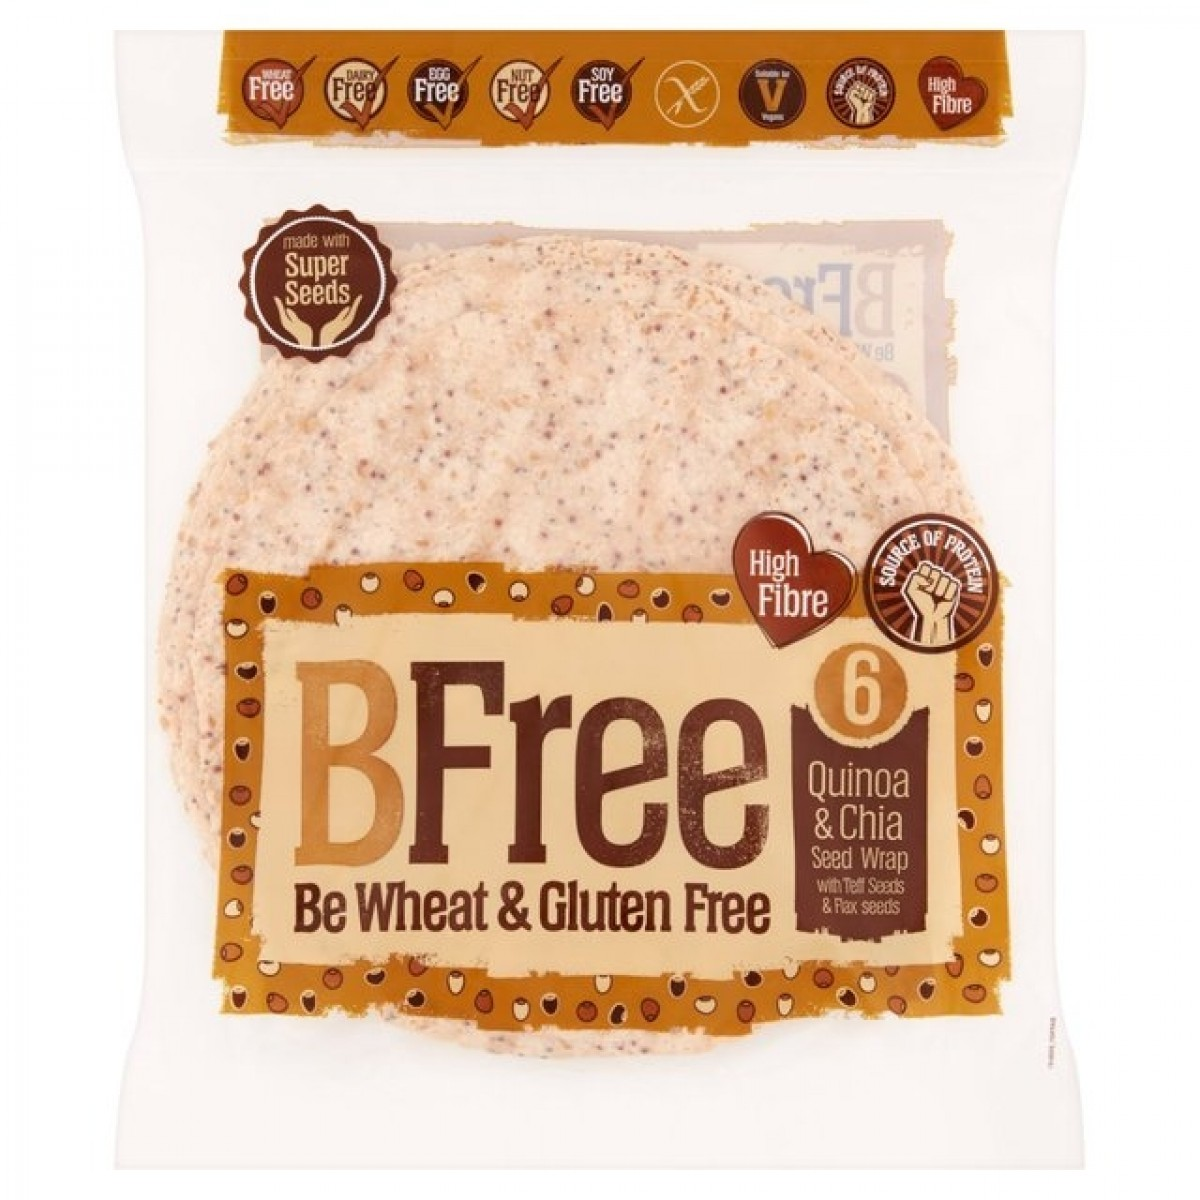 Quinoa & Chia Zaad Wrap (6 stuks)